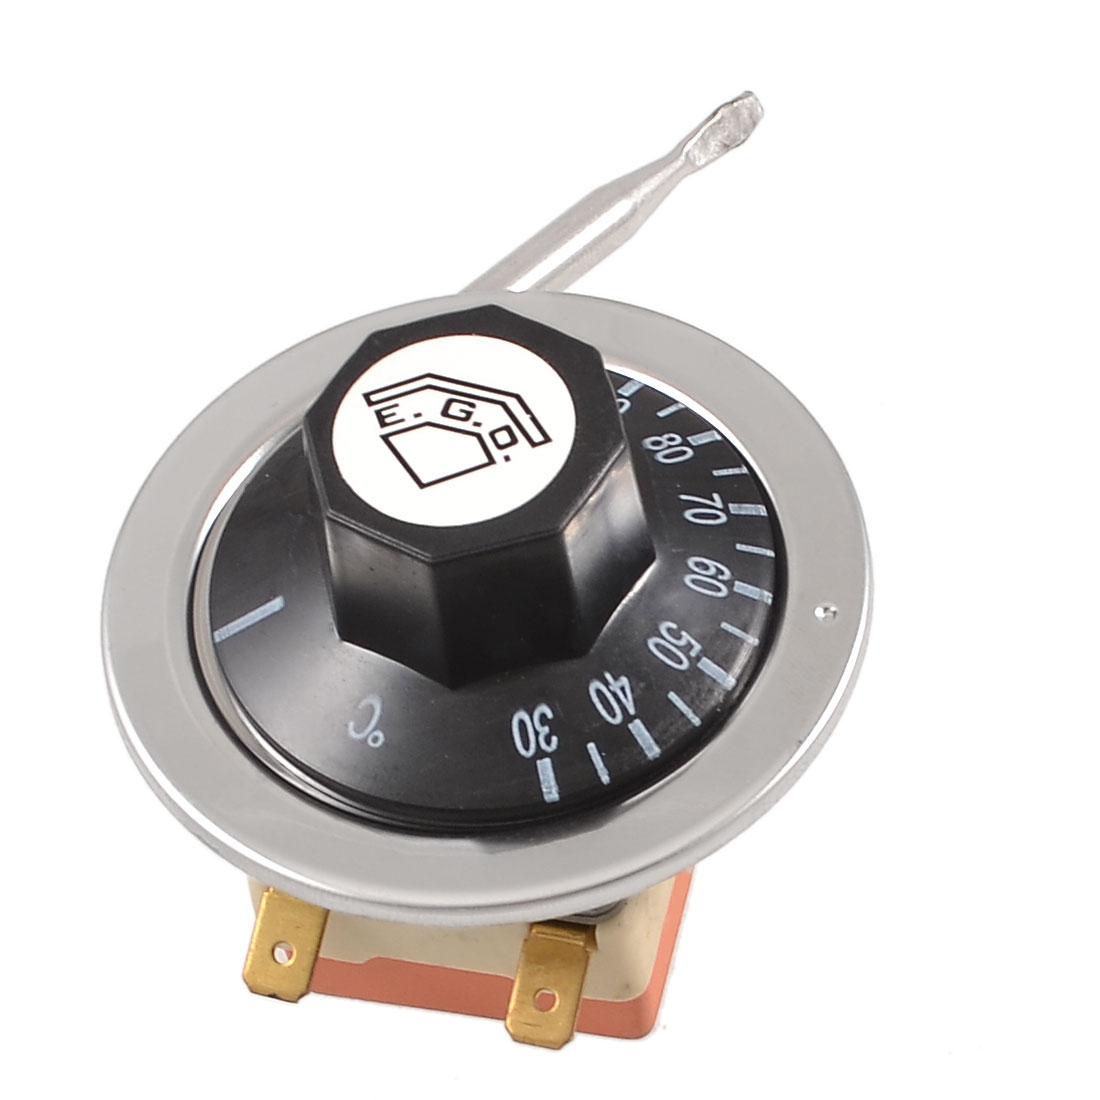 125V/250VAC 16A 30-110C Temperature Control Capillary Thermostat